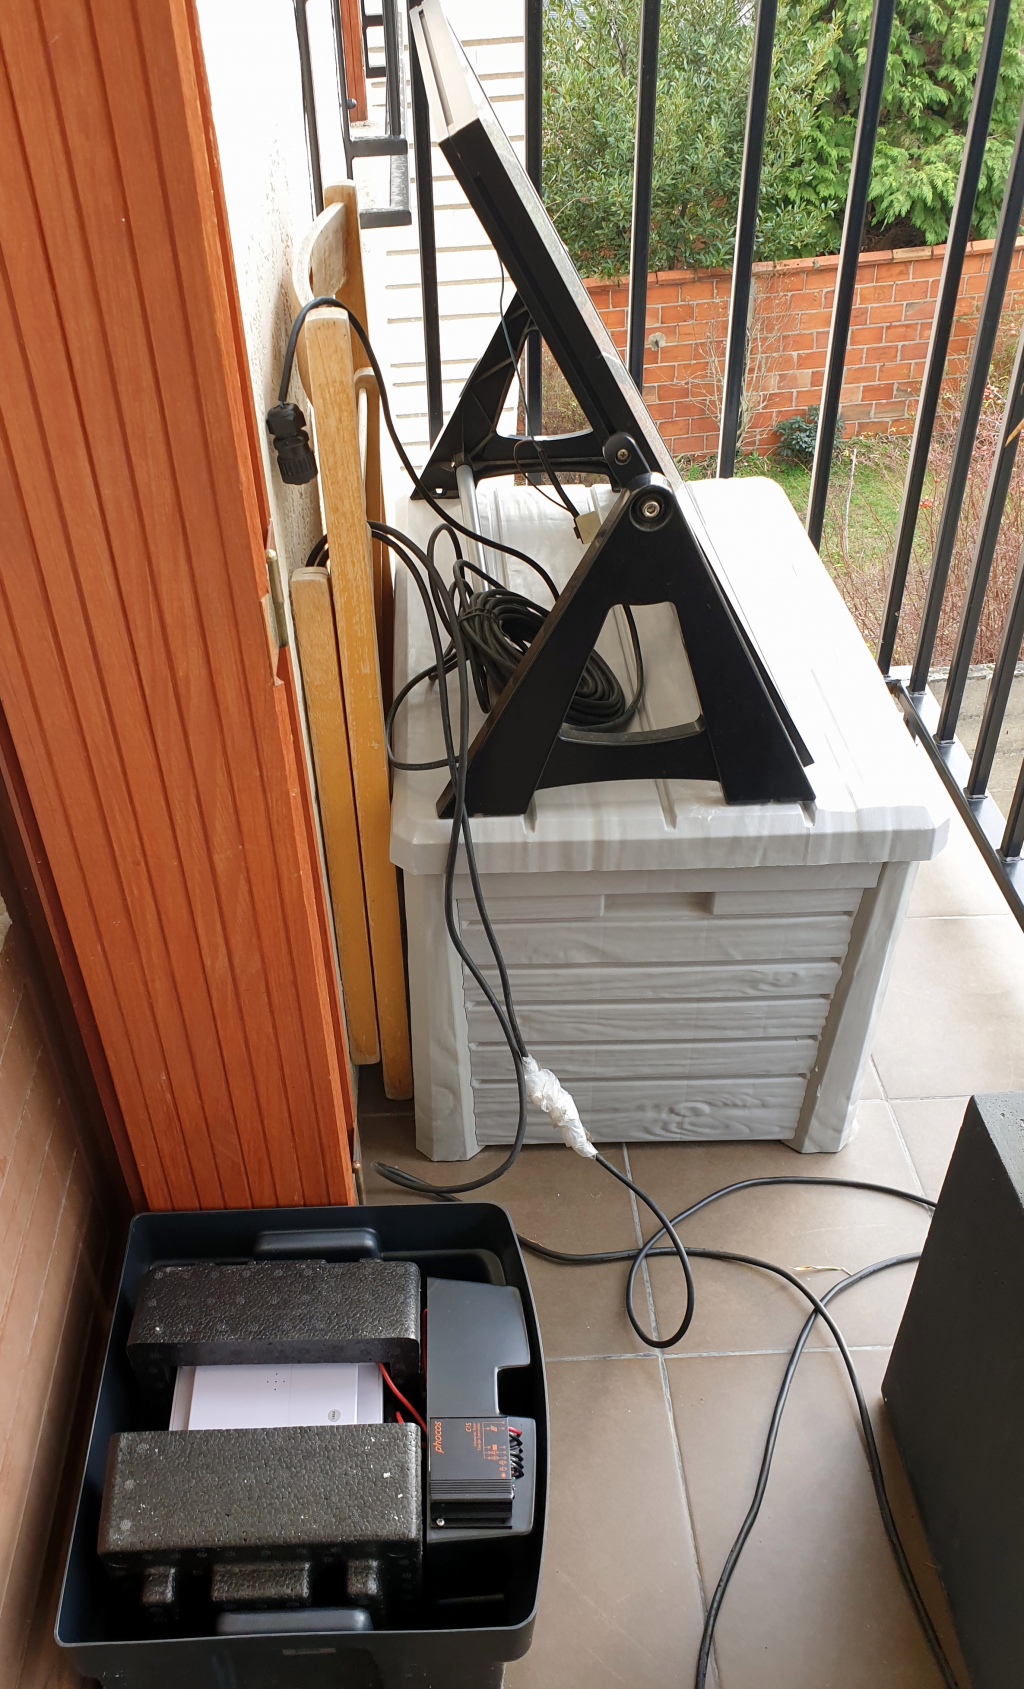 Installation kit solaire 170120